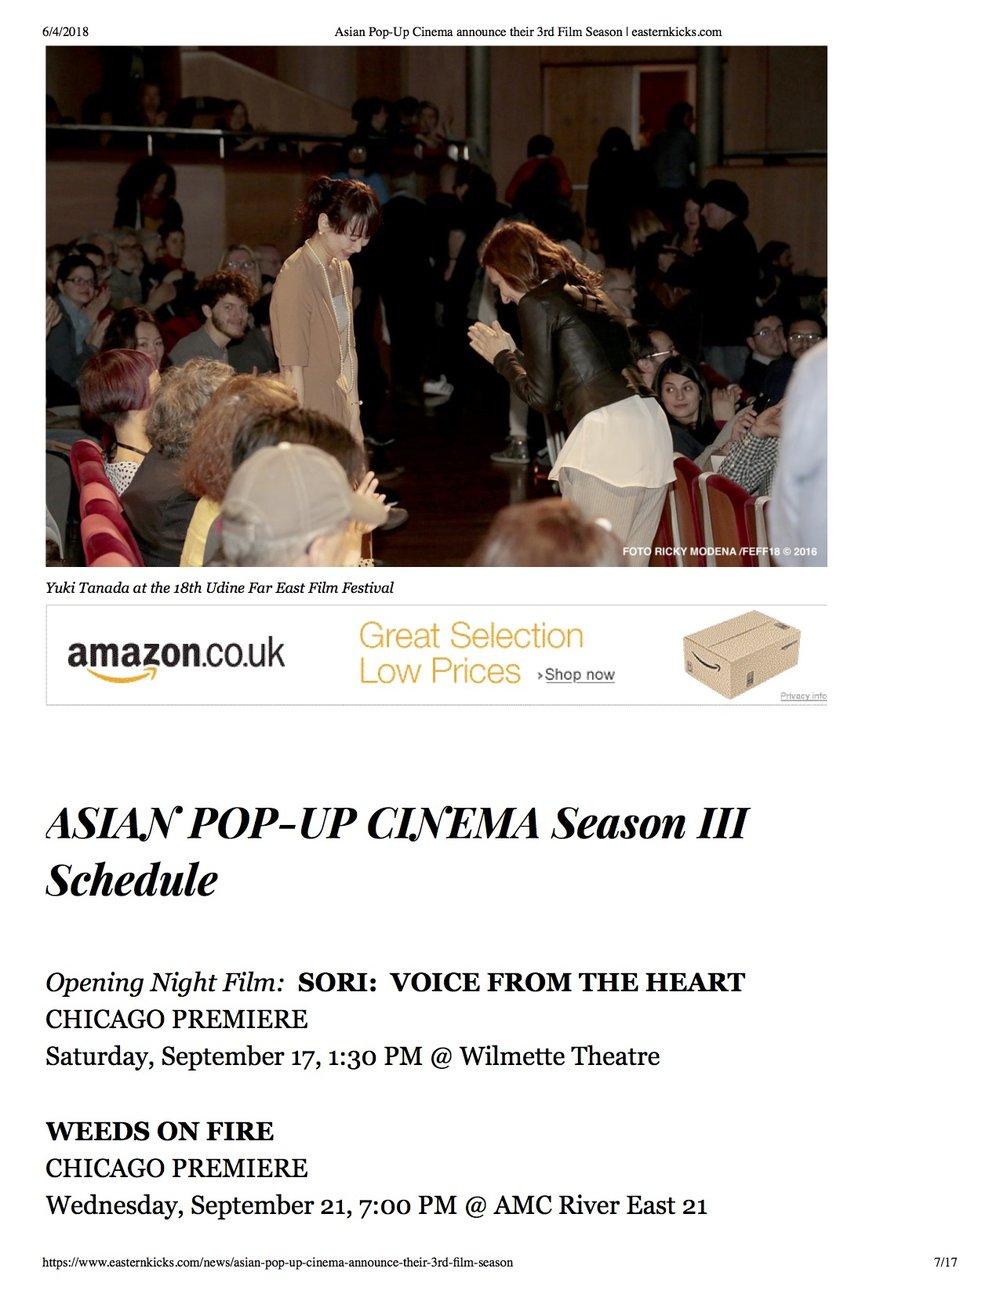 7Asian Pop-Up Cinema announce their 3rd Film Season _ easternkicks.jpg